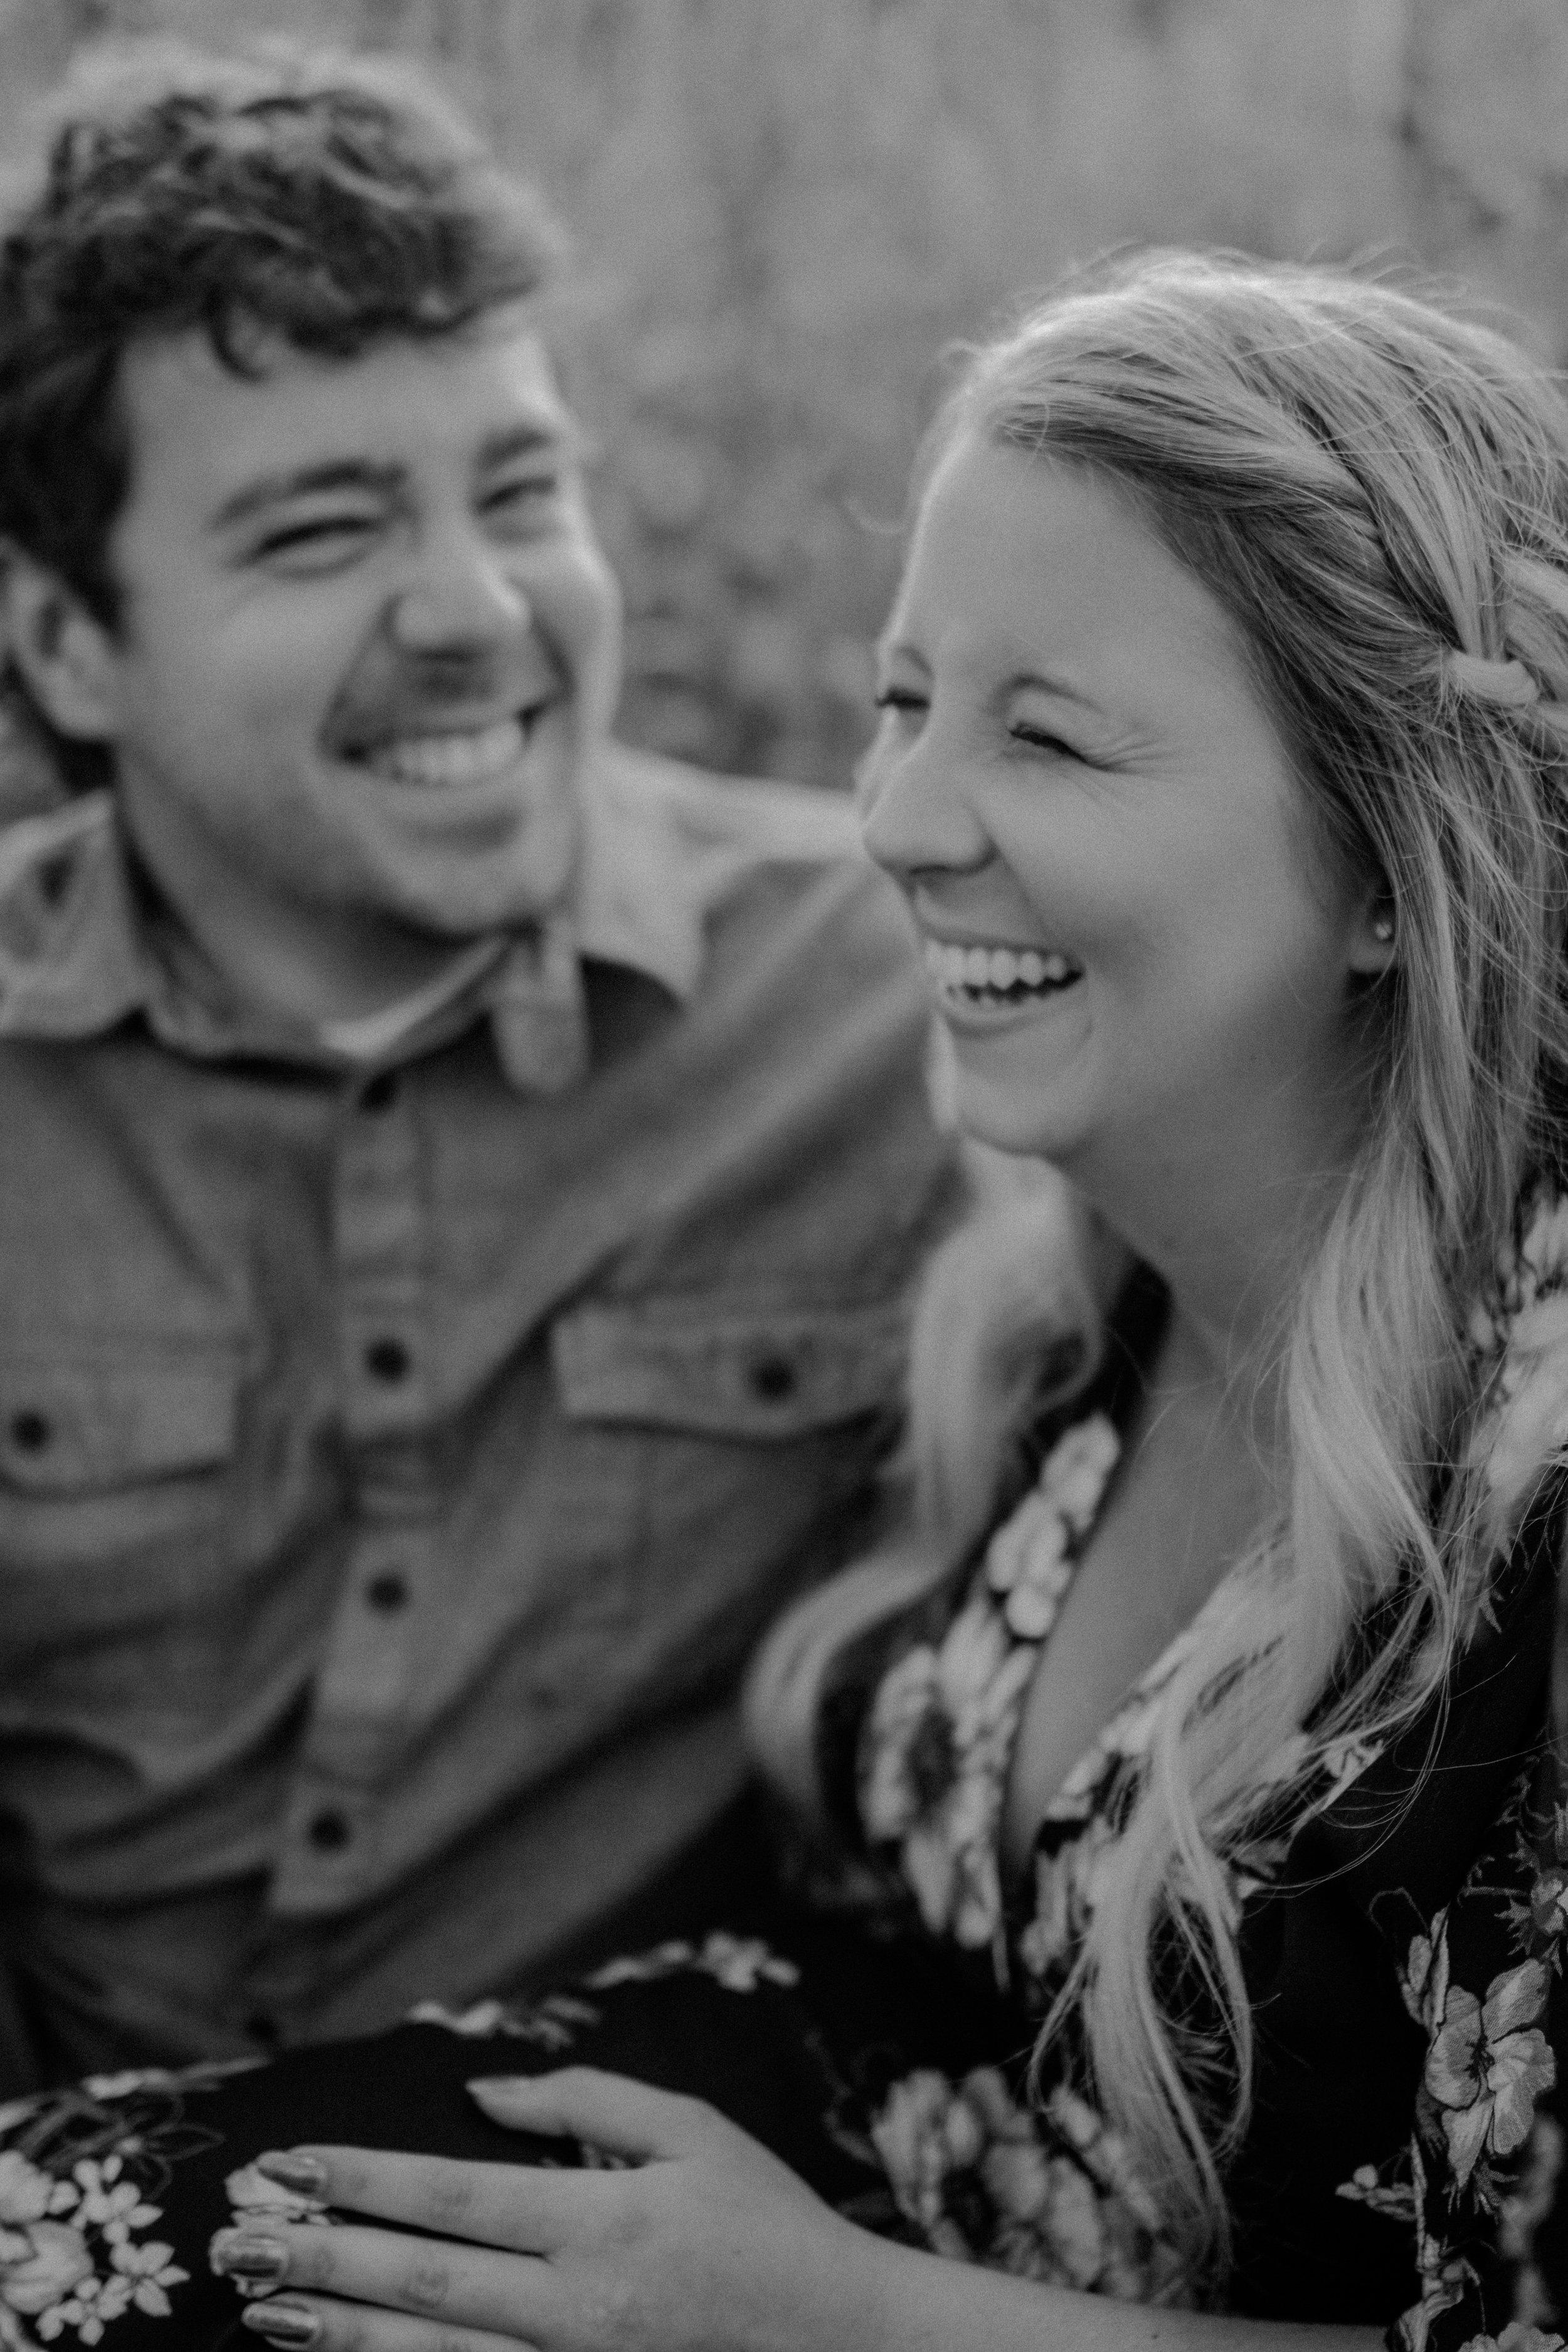 Cate_Ann_Photography_Dayton_Ohio_Wedding_Elopement_And_Engagement_PhotographerDSC_1119.jpg